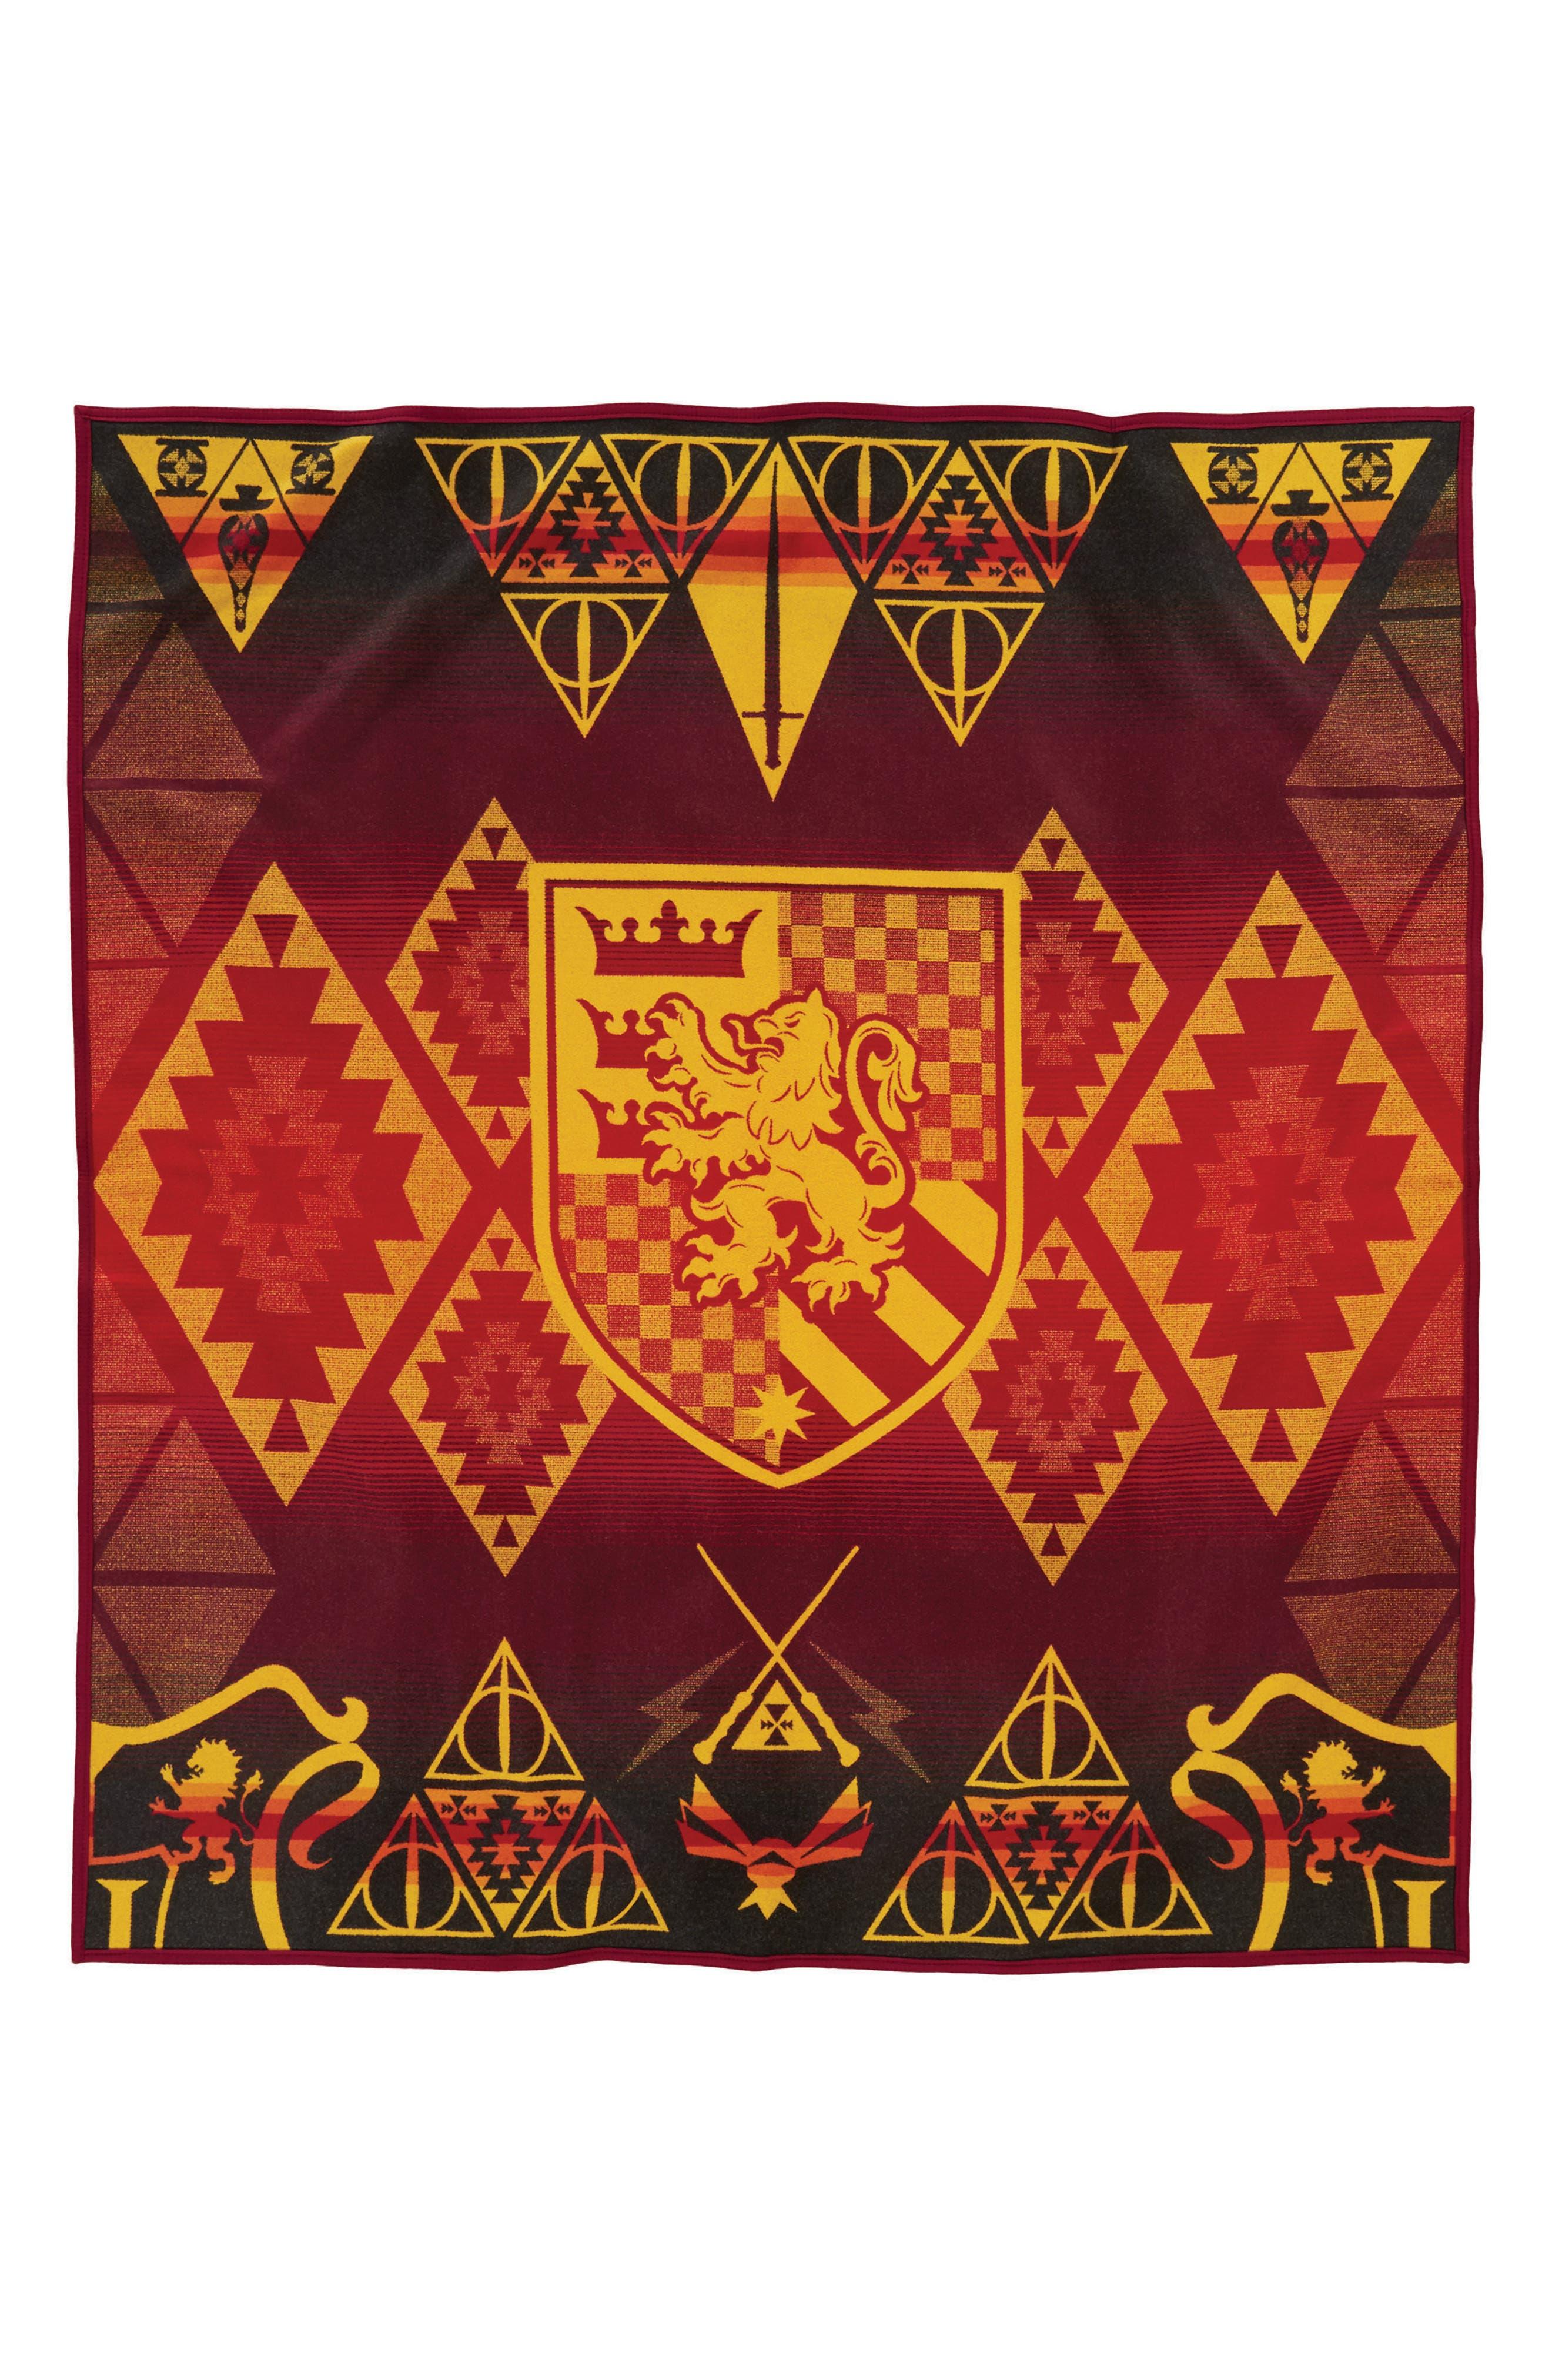 Harry Potter - Gryffindor Blanket,                             Main thumbnail 1, color,                             Red